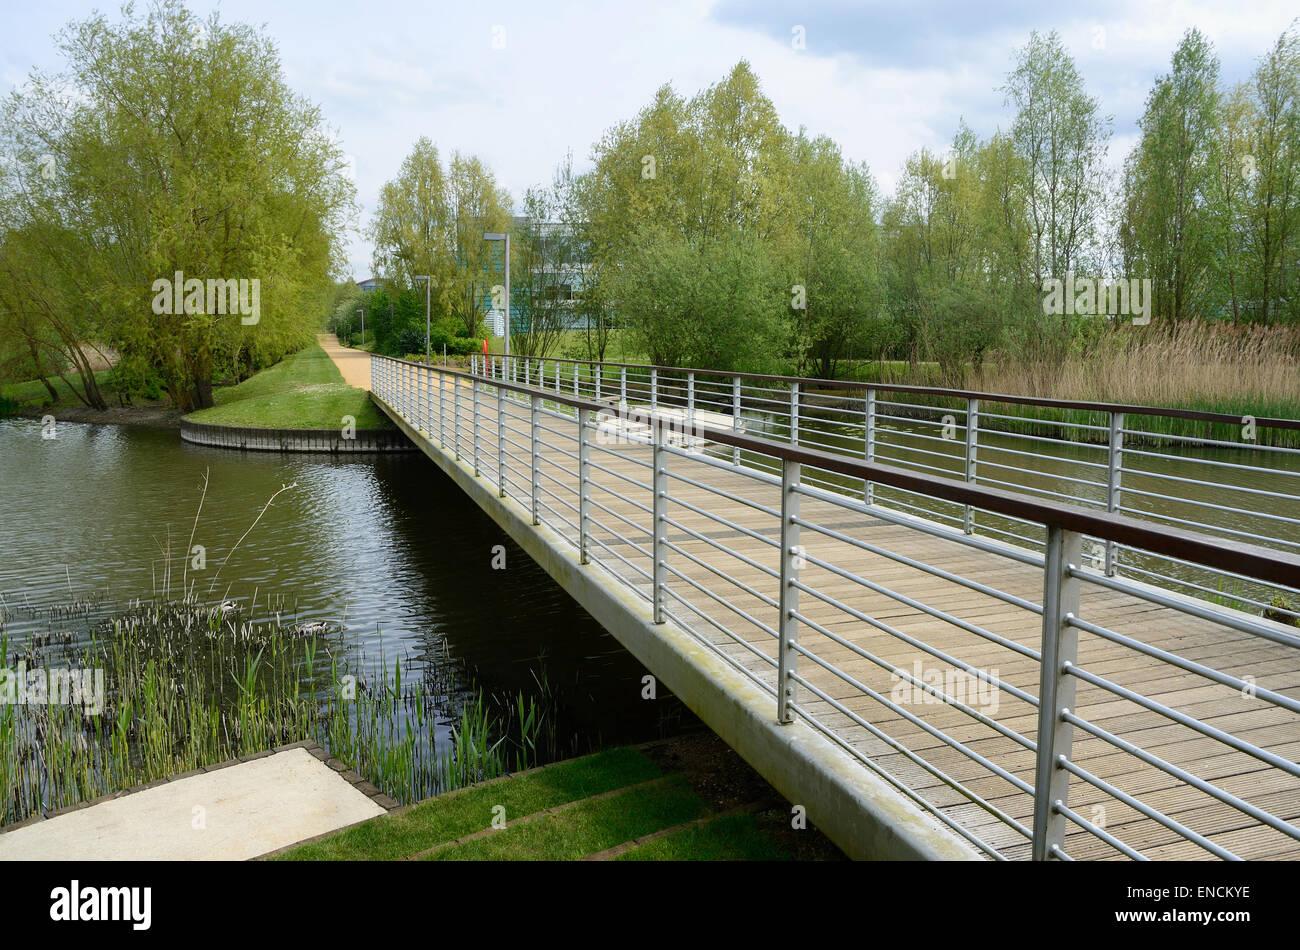 a-bridge-over-the-lake-at-green-park-reading-ENCKYE.jpg